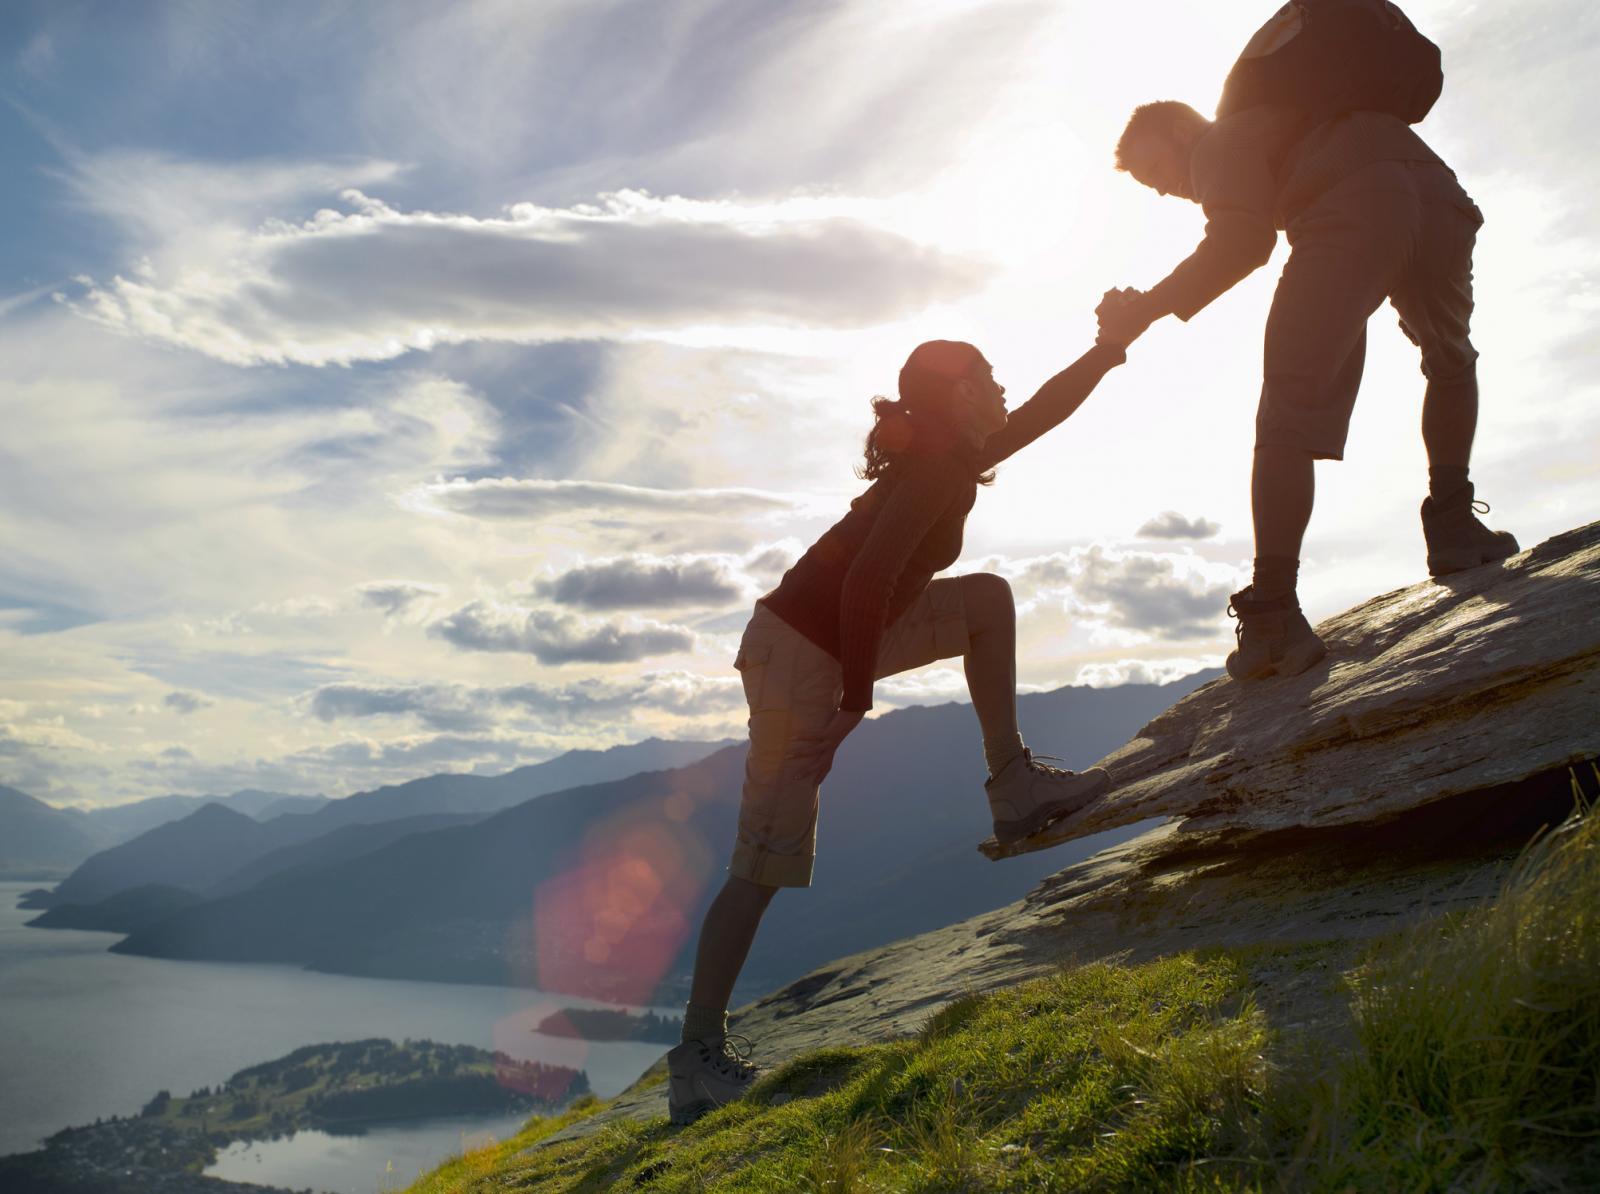 Silhouette of couple climbing hillside near a lake